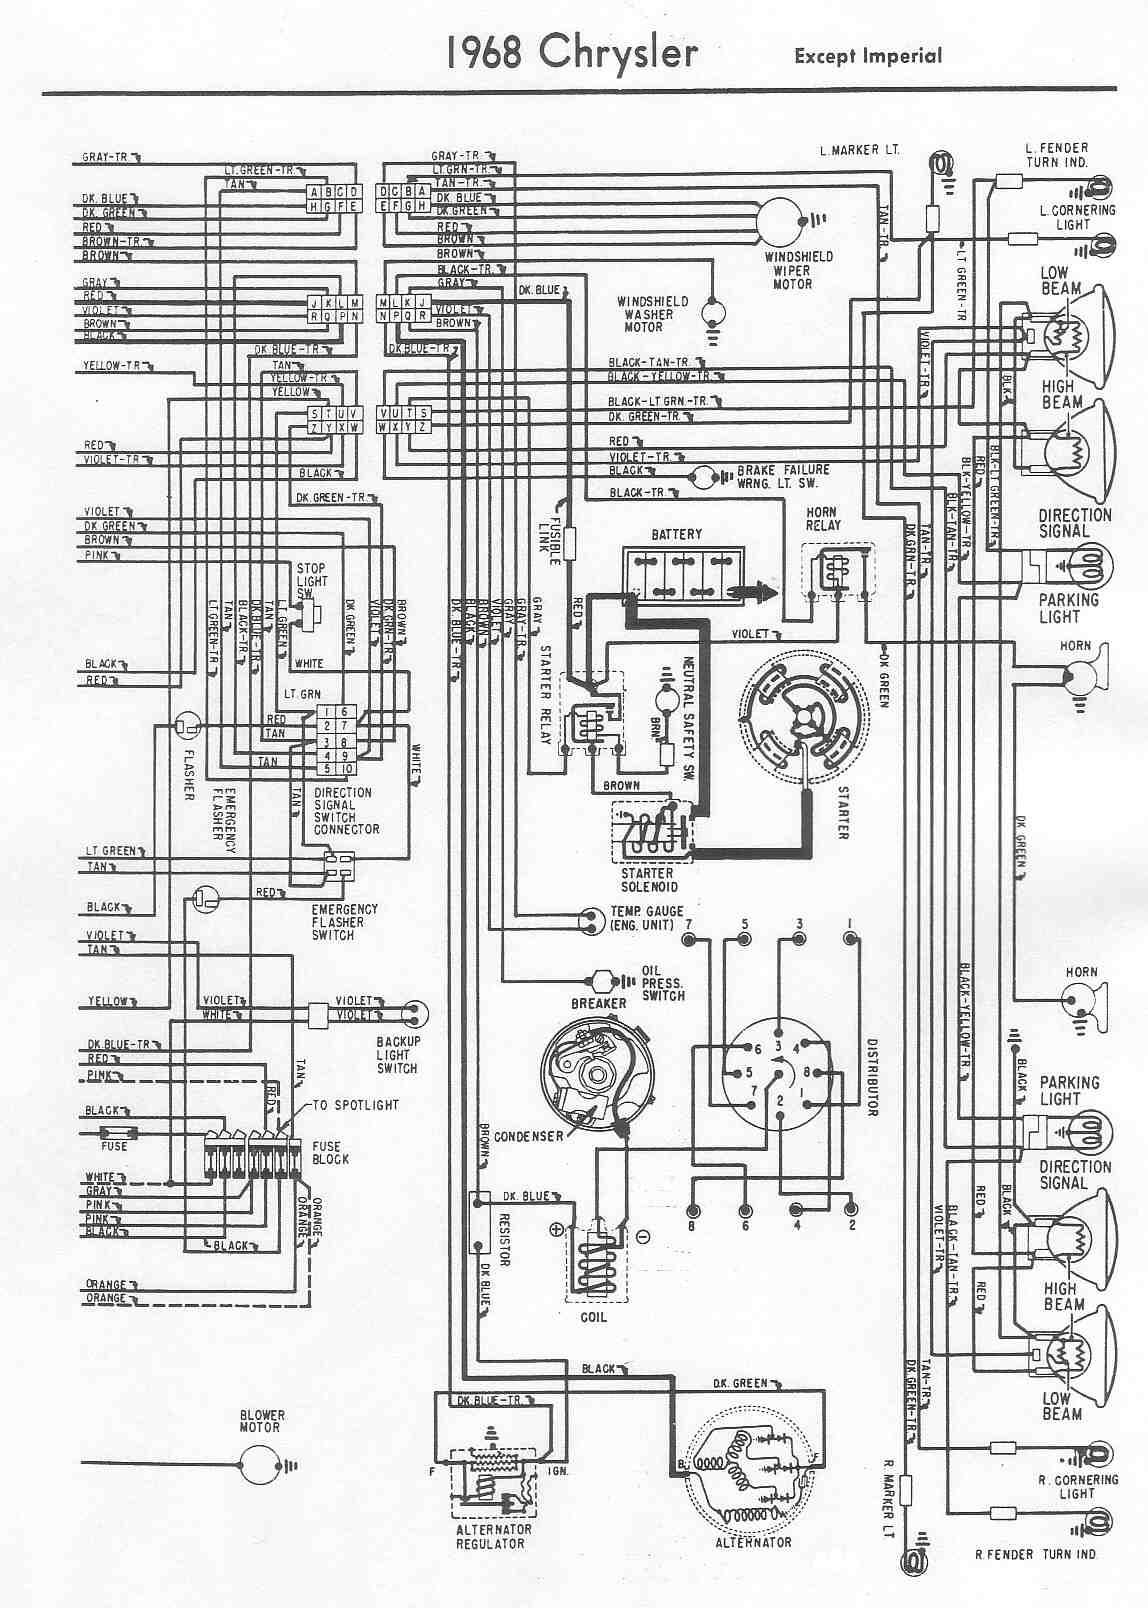 429 cadillac engine diagram free download wiring diagram schematic1968 cadillac engine diagram 6 stromoeko de u2022 [ 1148 x 1608 Pixel ]